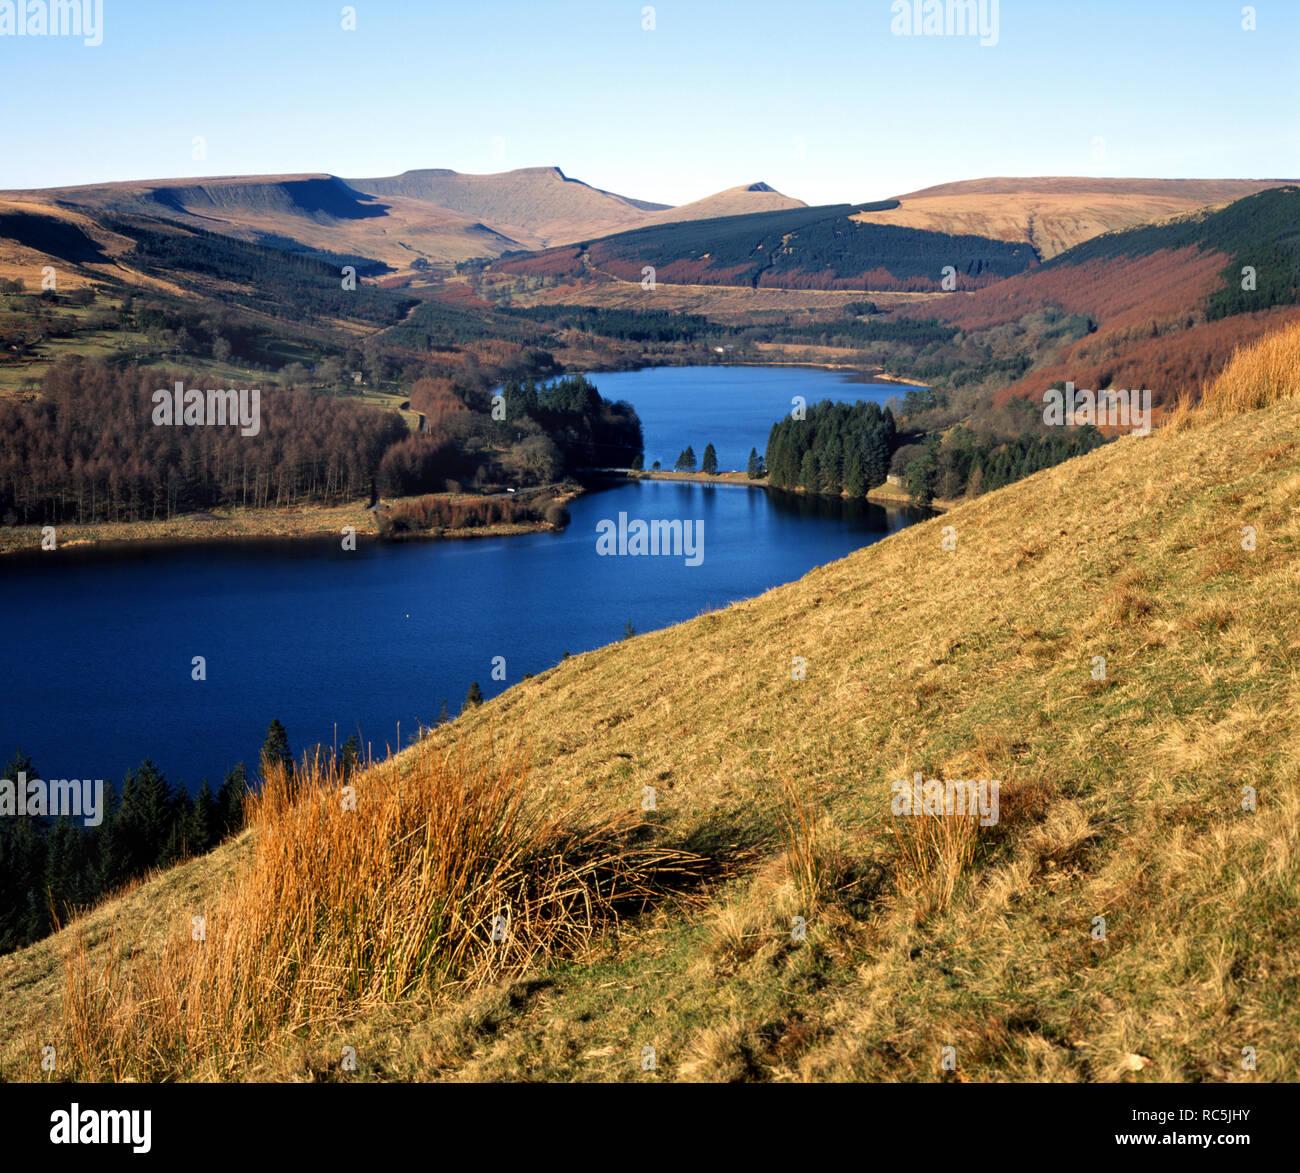 Taf Fechan Reservoirs, Brecon Beacons National Park, Powys, Wales, UK. Stock Photo